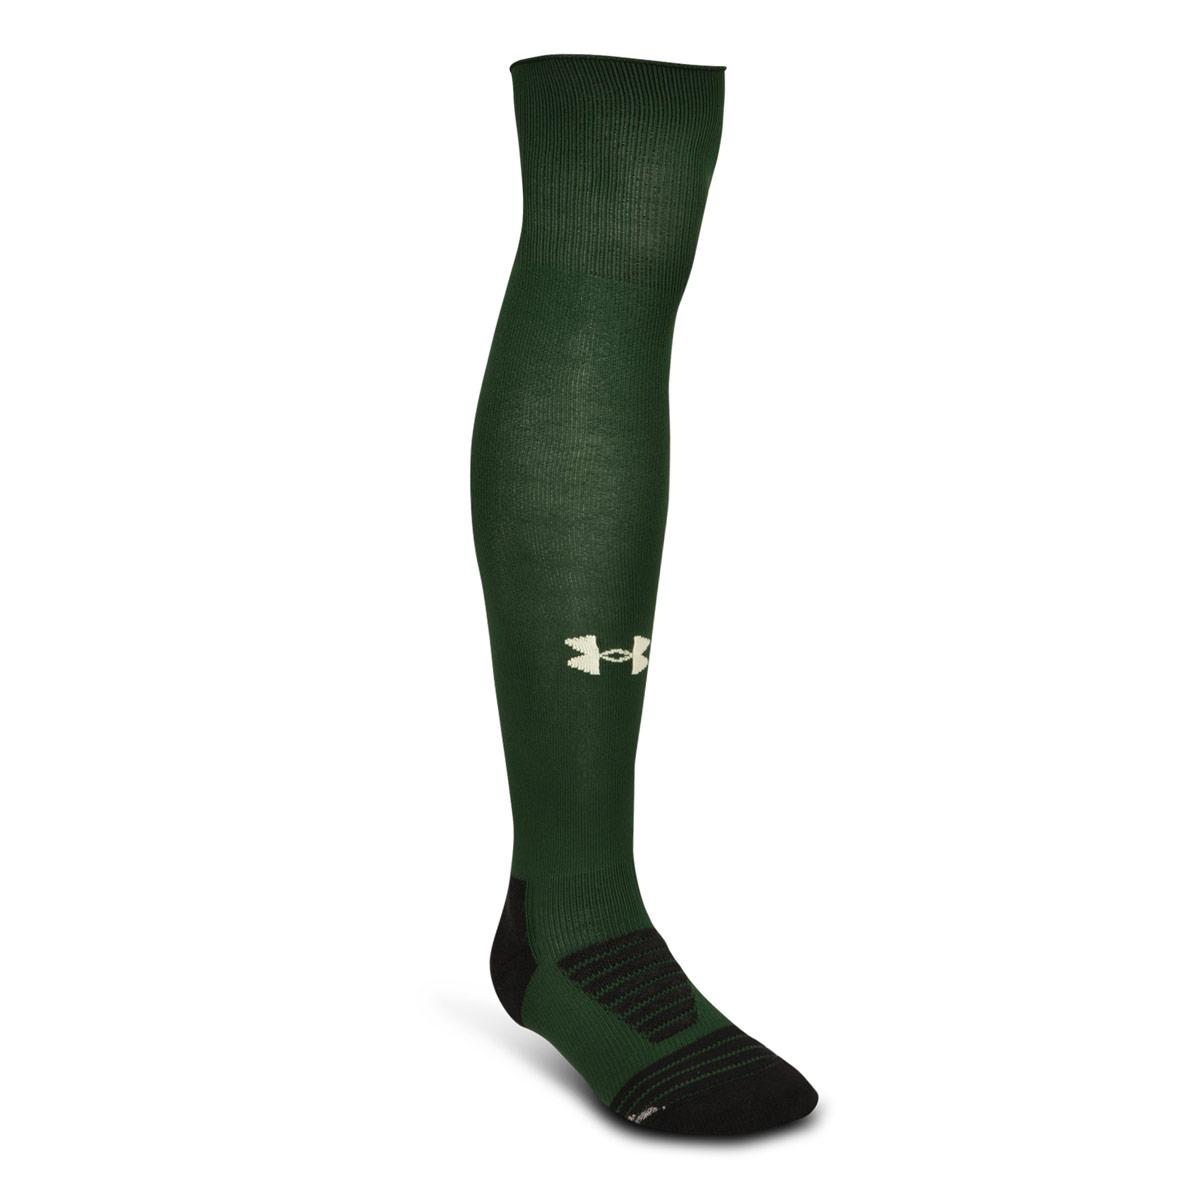 933a5f55a 2020 Kids Wales Alternate Rugby Socks | rugbystore